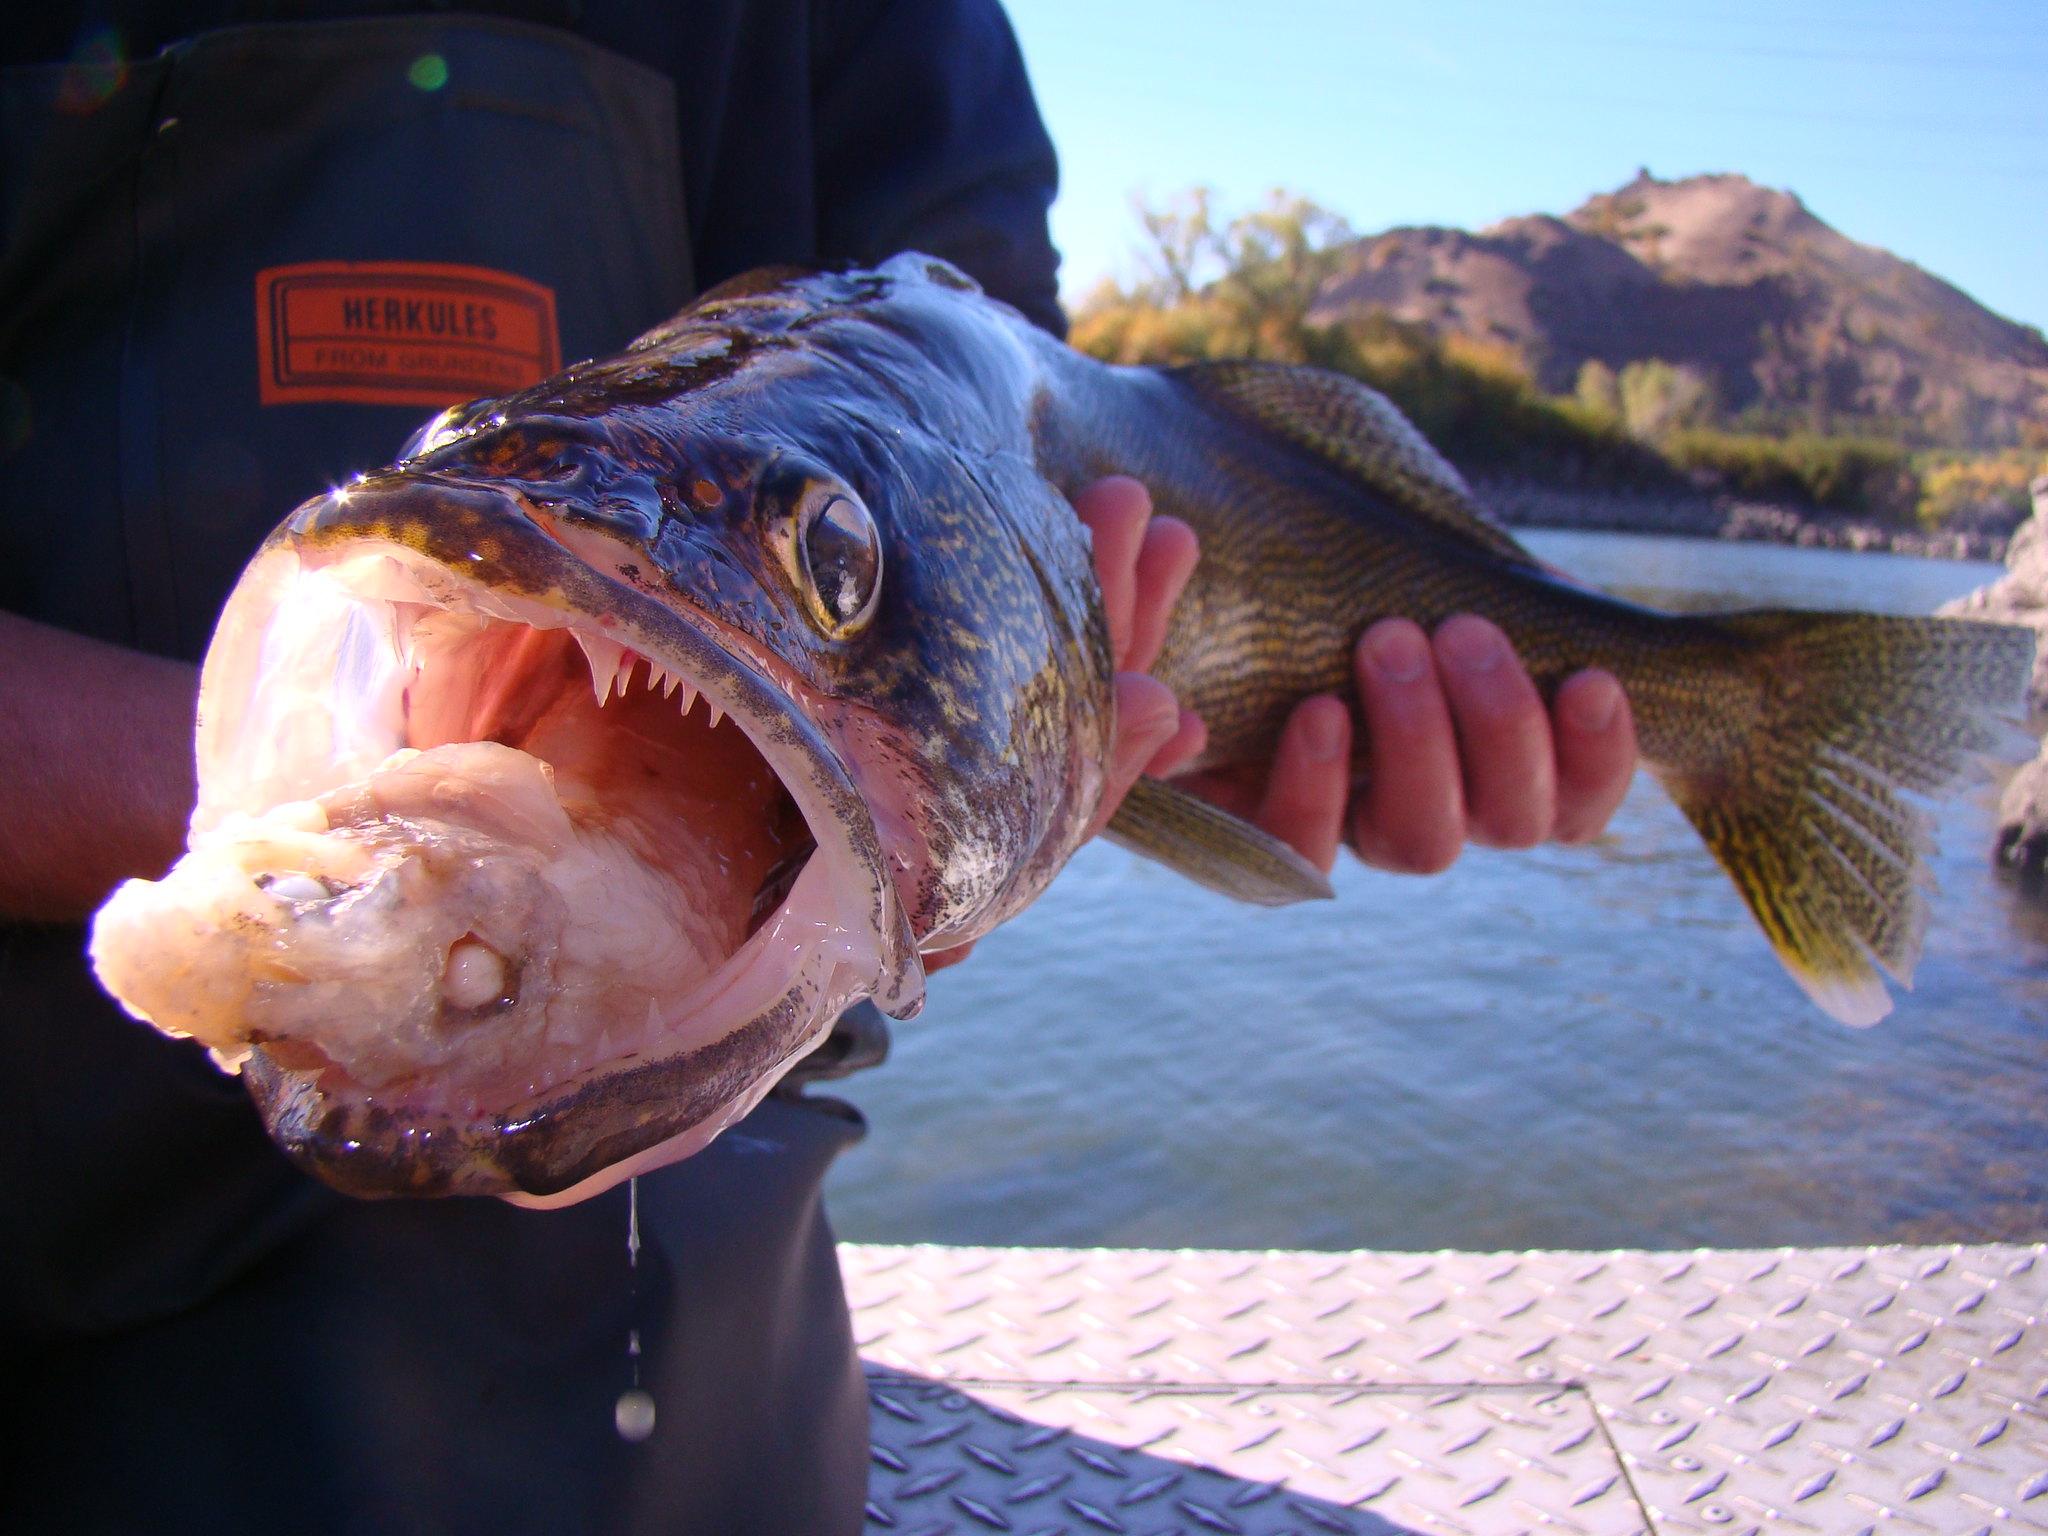 Columbia river walleye flickr photo sharing for Walleye fishing columbia river